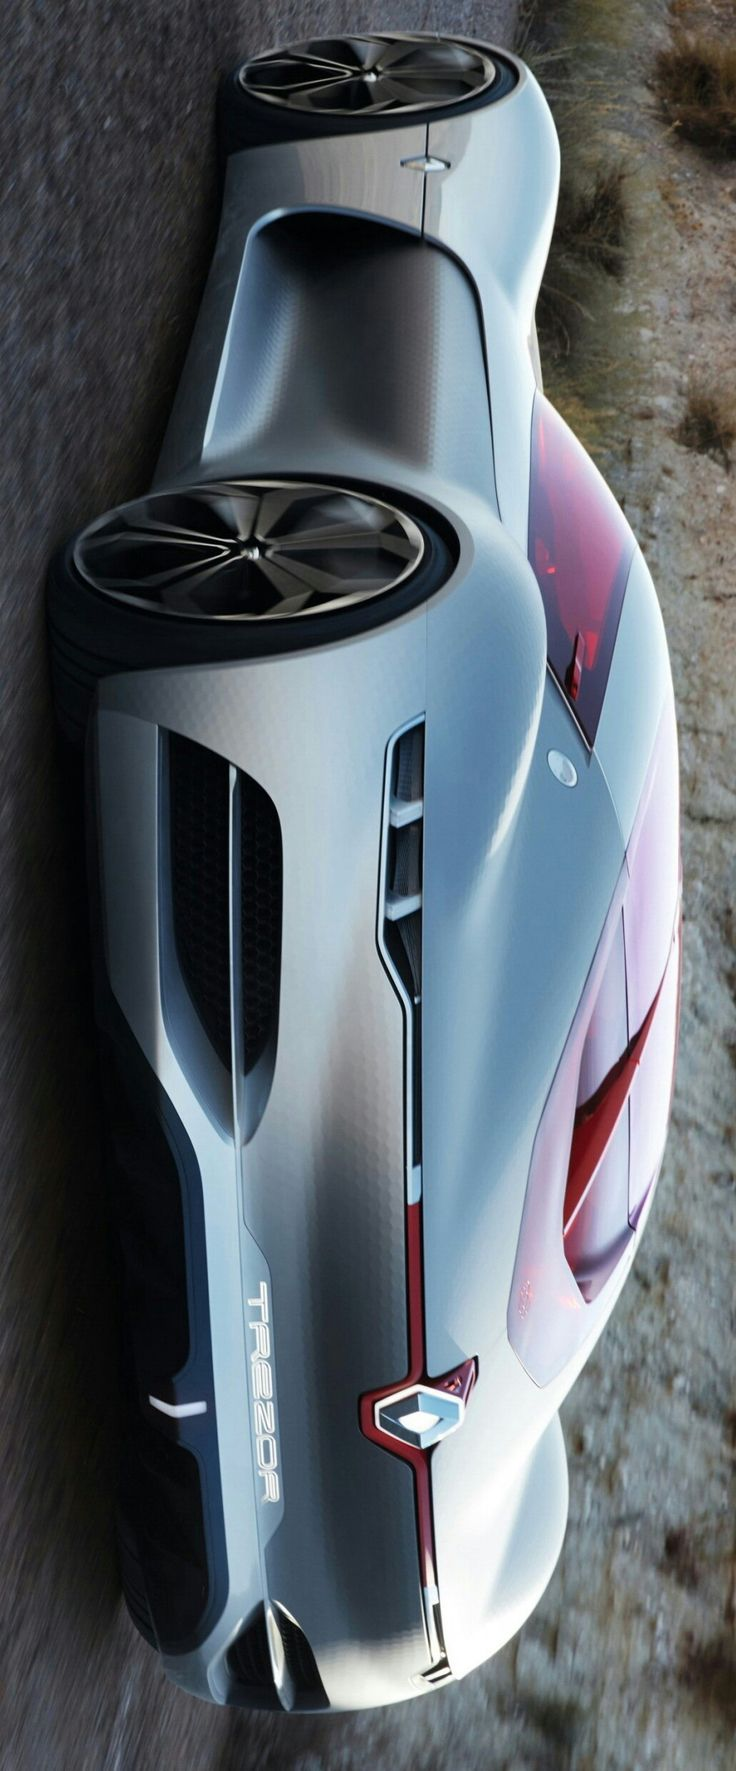 2016 Renault Trezor Concept by Levon                                                                                                                                                                                 More